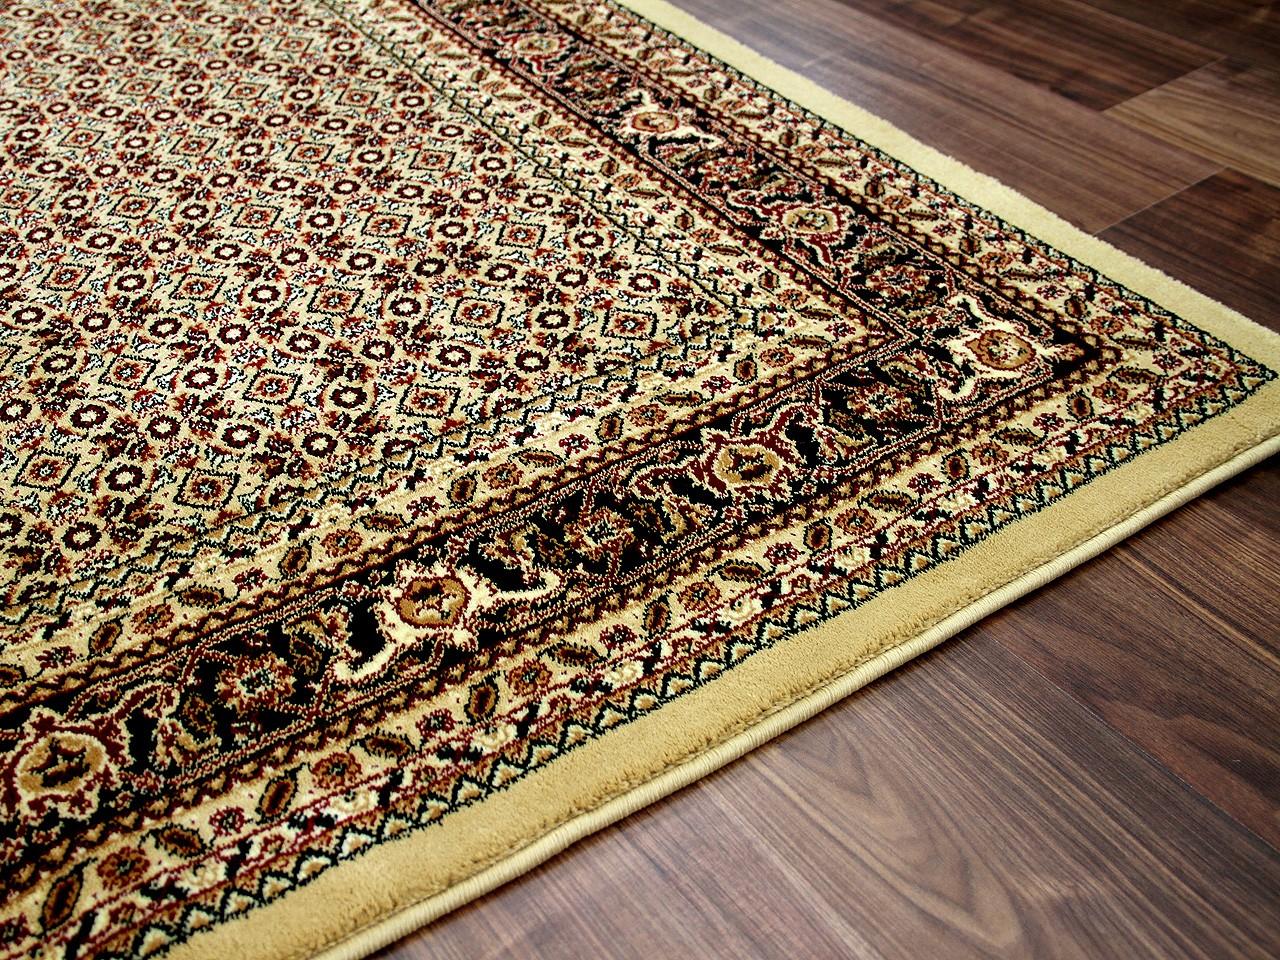 orient teppich marrakesh herati beige teppiche orientteppiche marrakesh orientteppiche. Black Bedroom Furniture Sets. Home Design Ideas